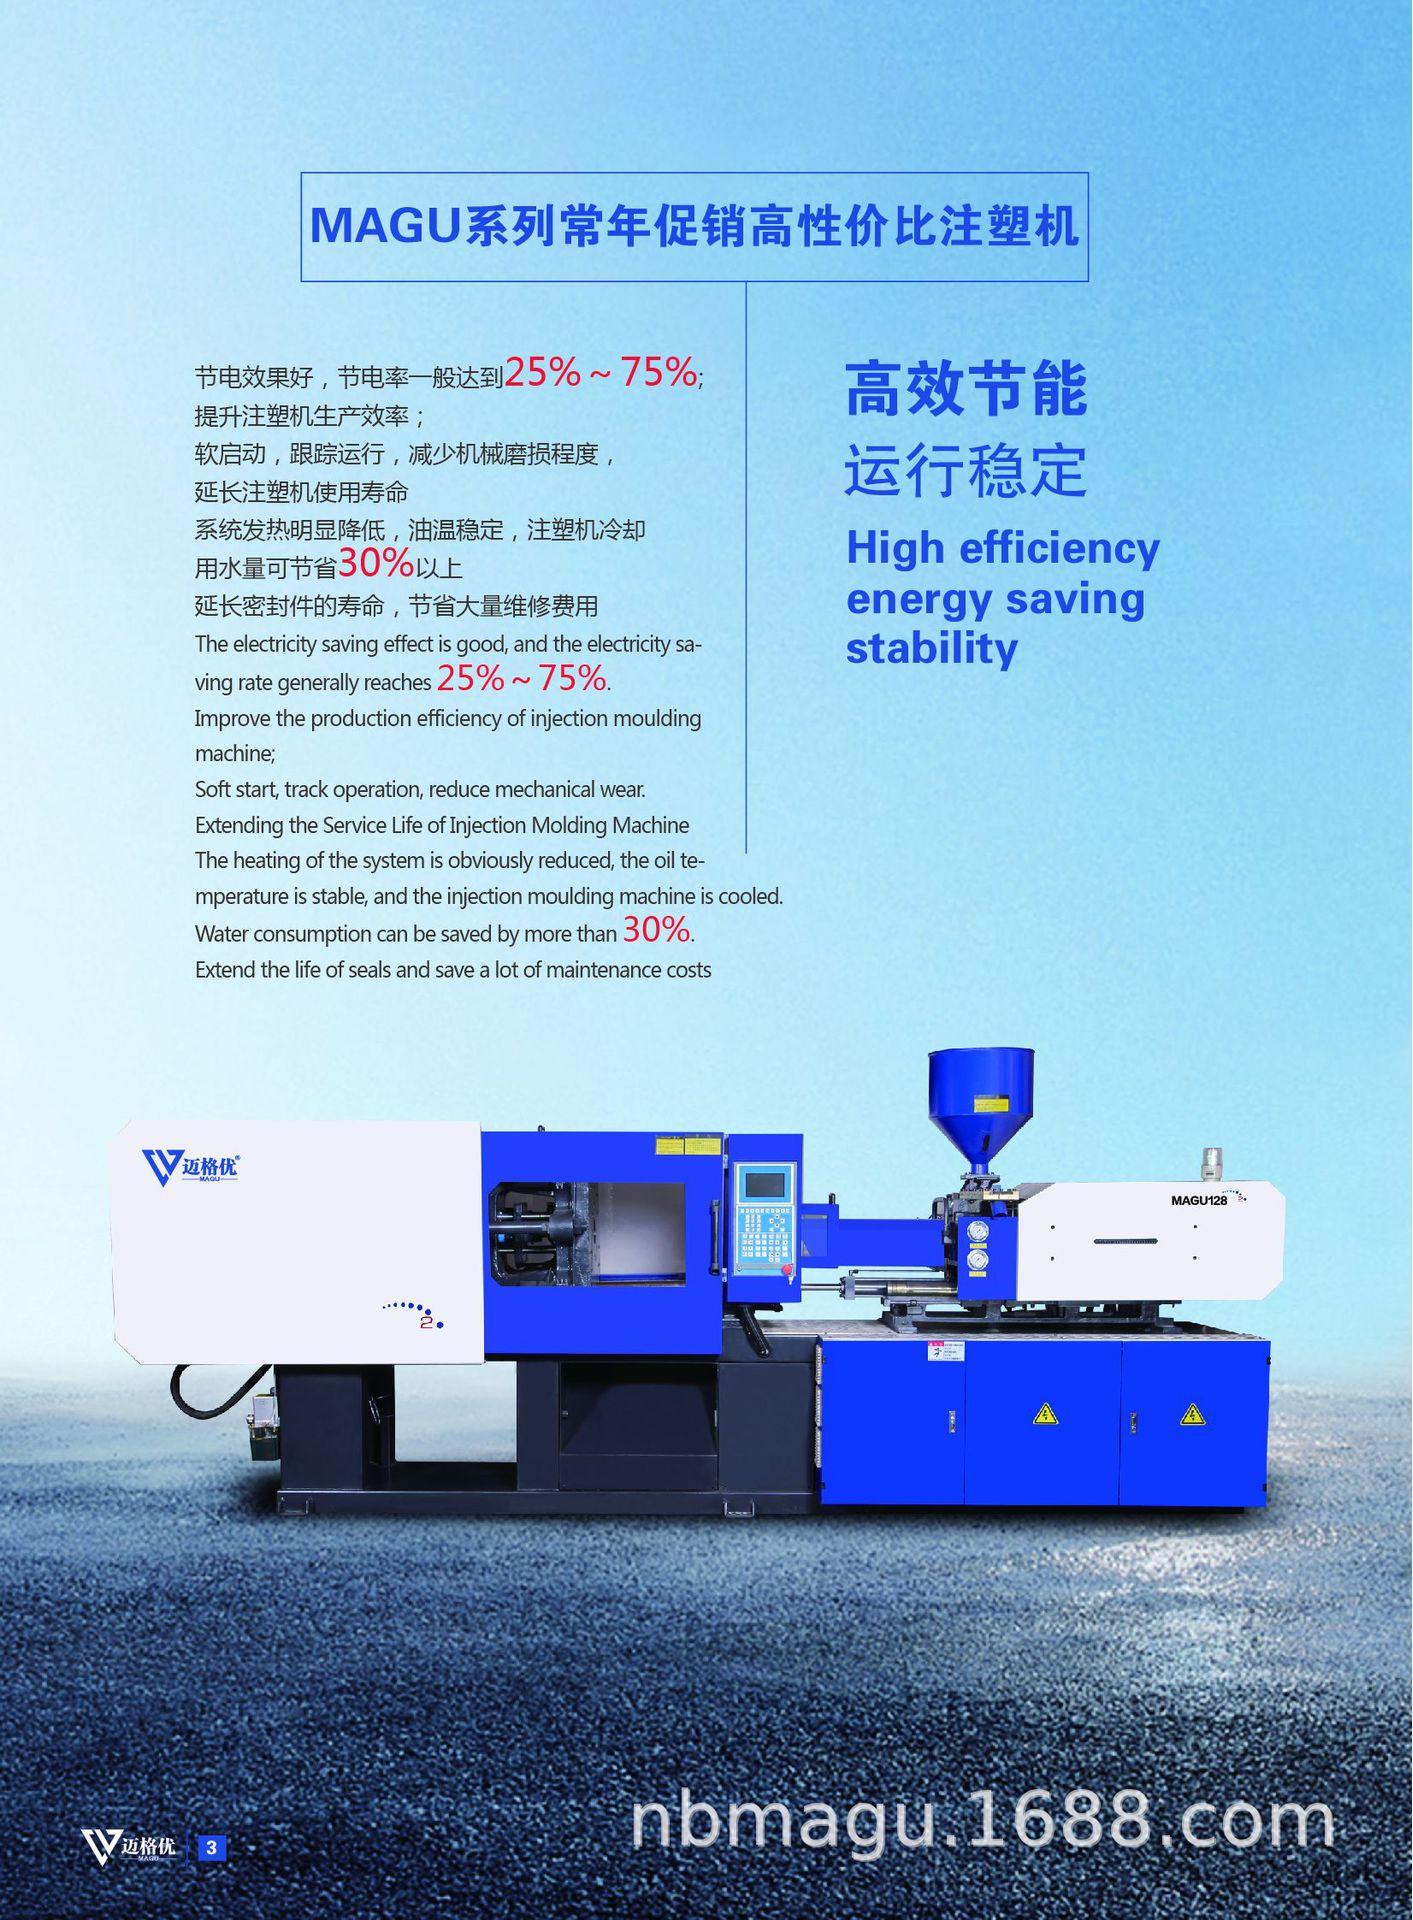 Factory Direct Servo Injection Molding Machine Magu268